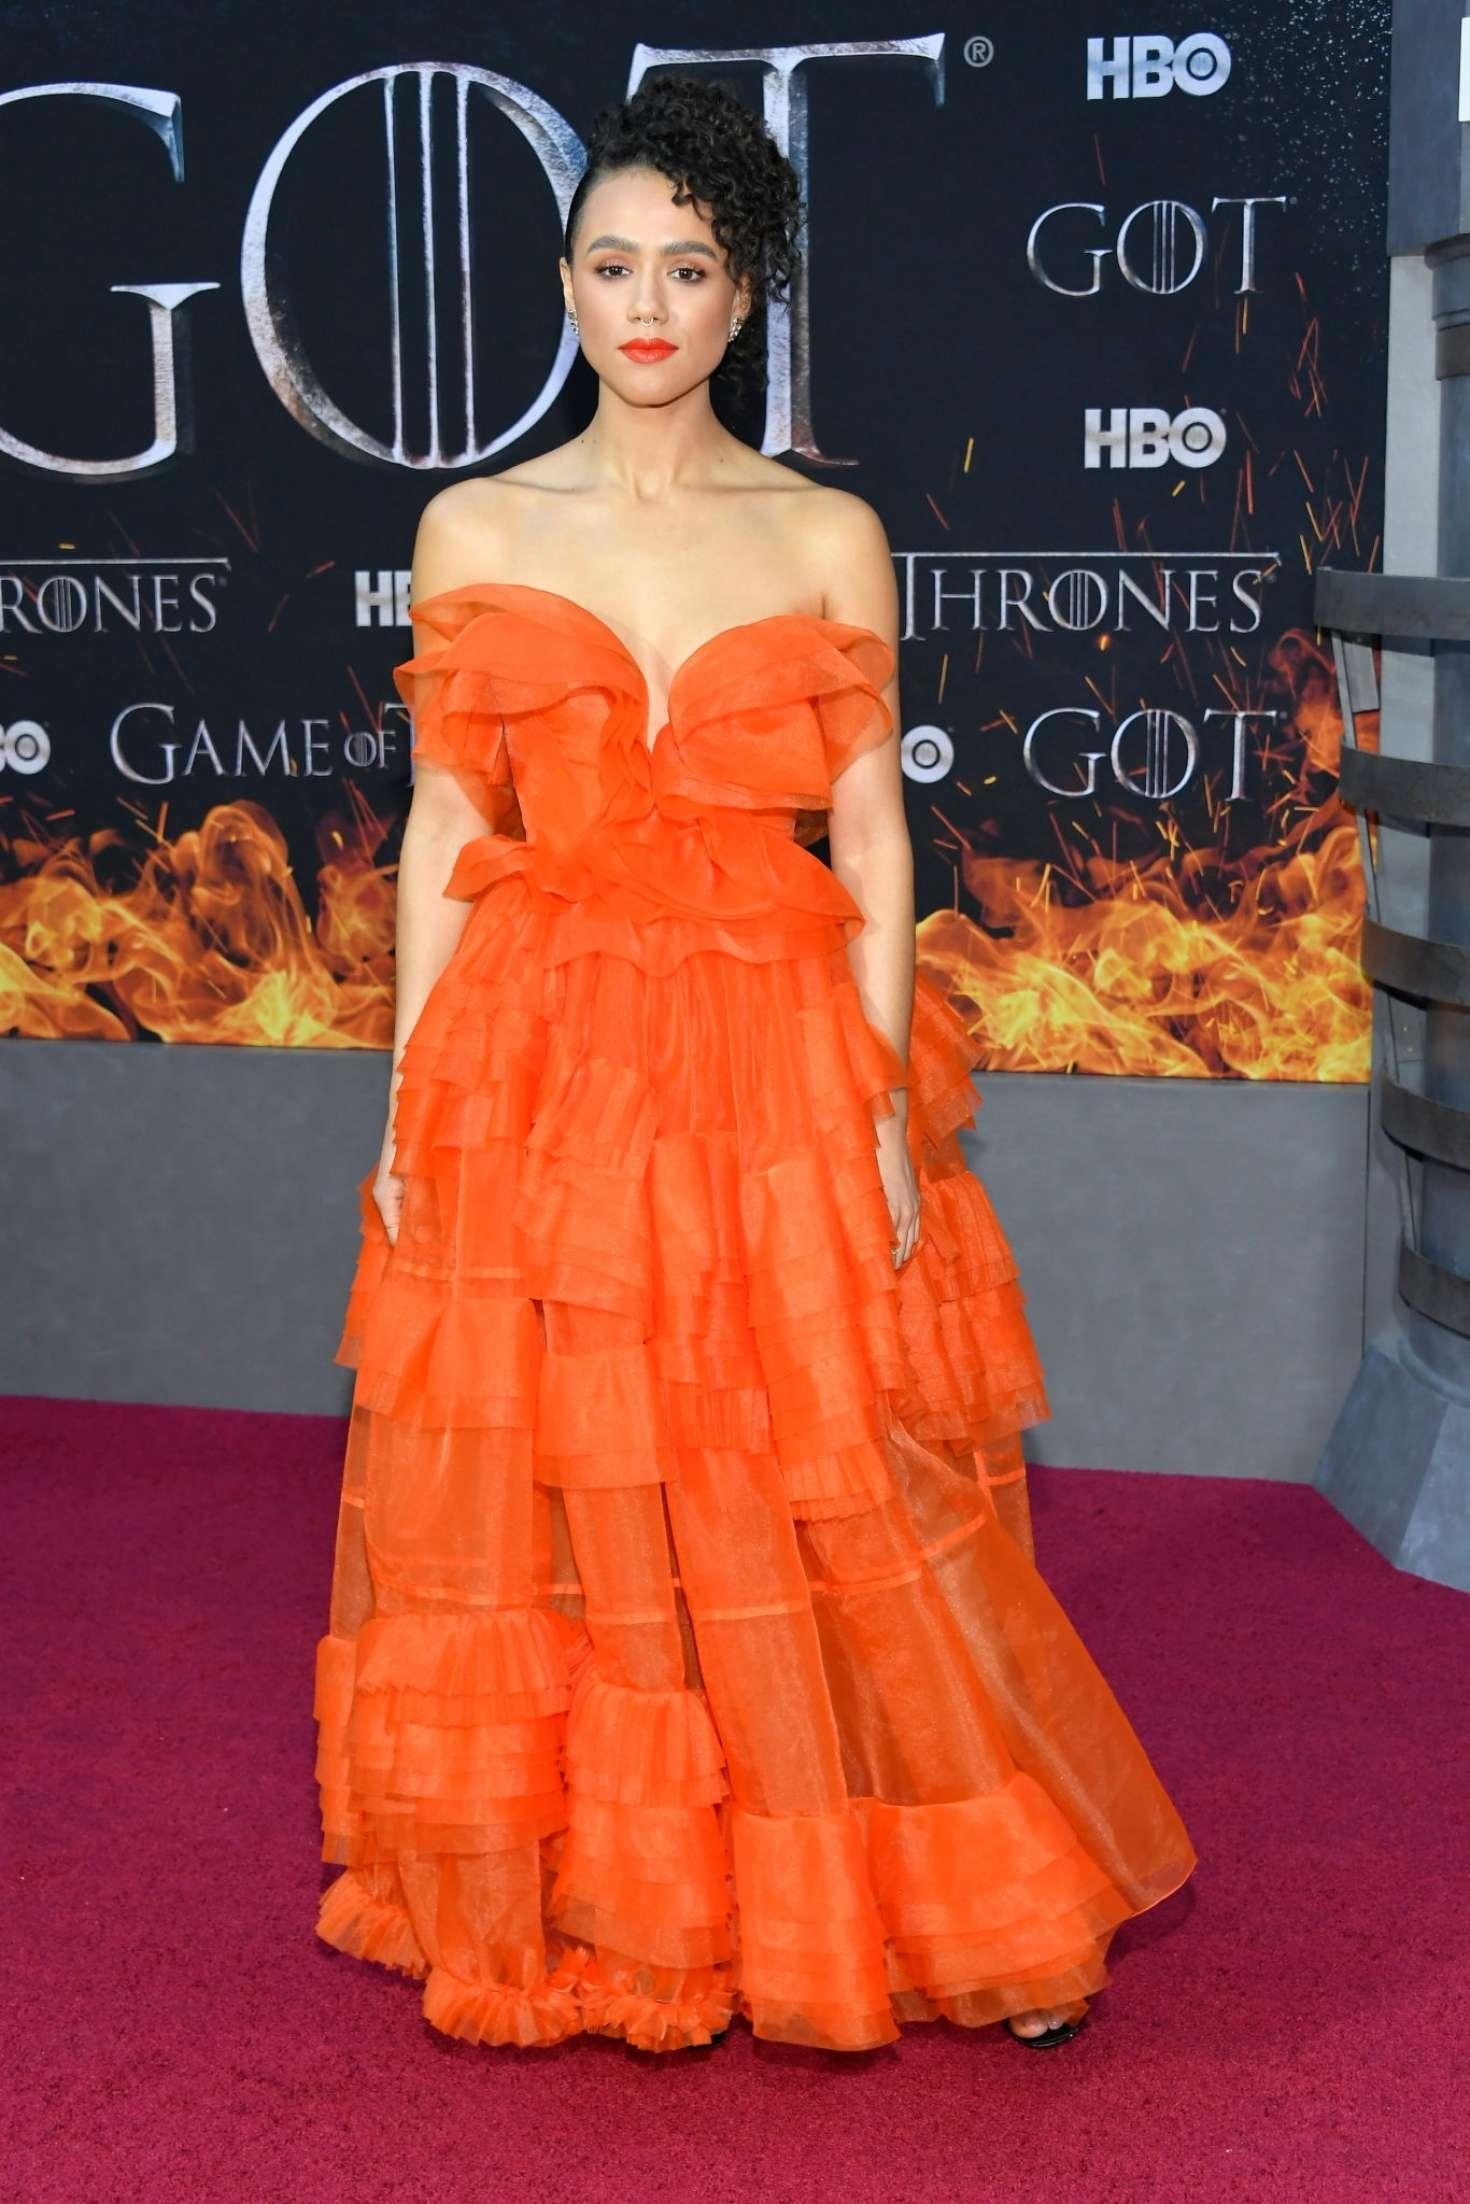 Nathalie Emmanuel 2019 : Nathalie Emmanuel: Game of Thrones Season 8 Premiere -09